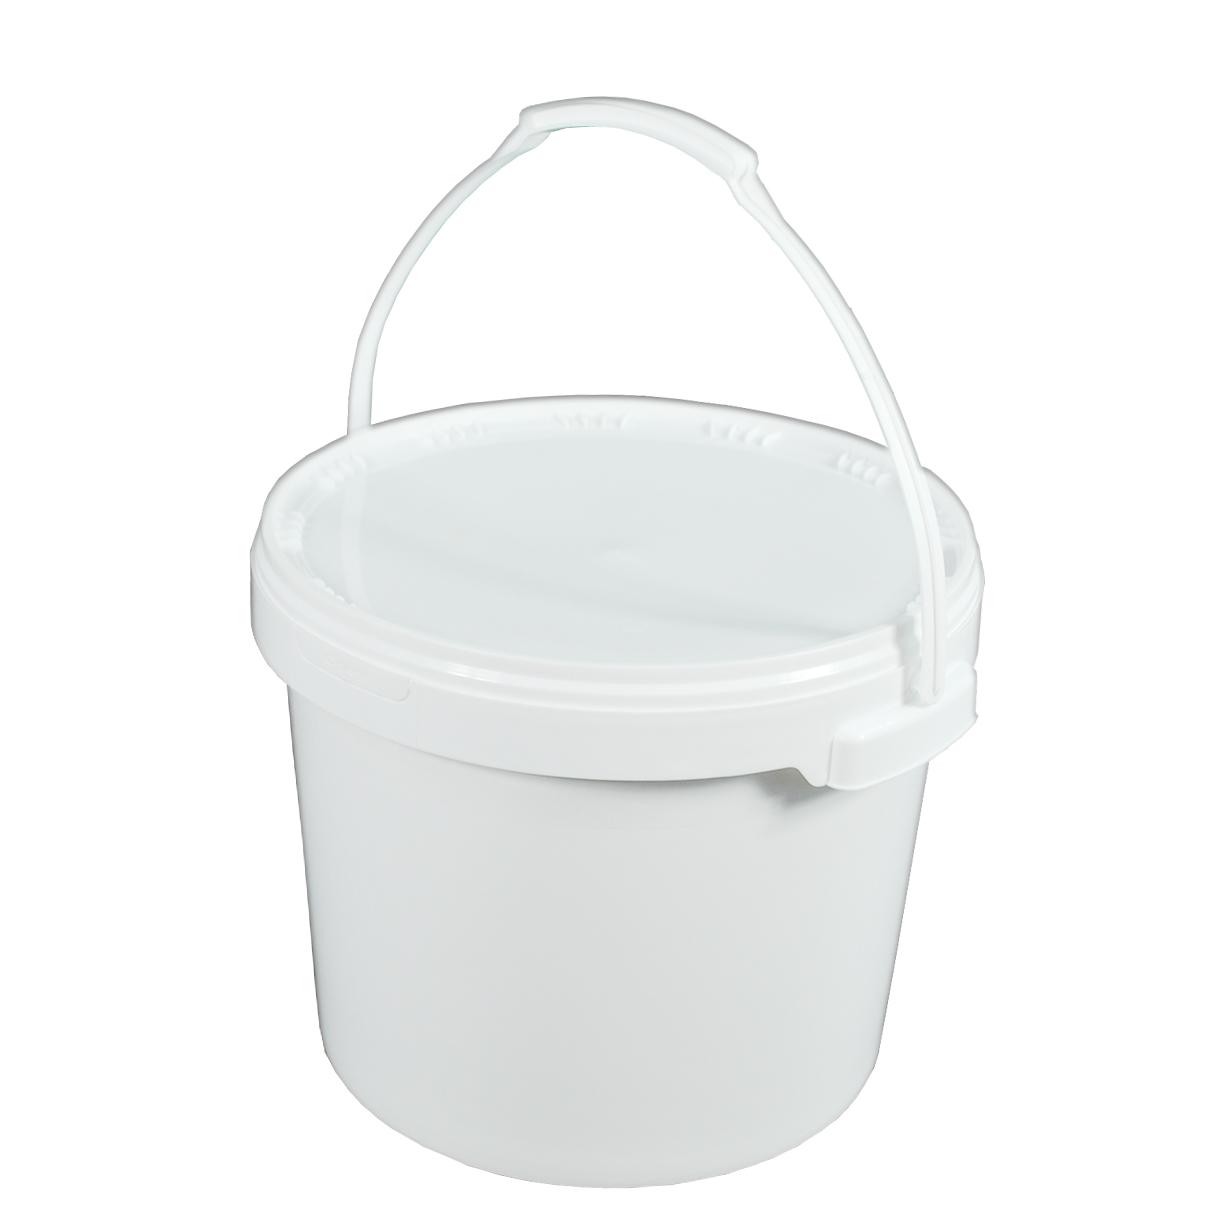 Top Eimer Deckel lebensmittelecht 15 L Liter leer weiß Henkel RE18